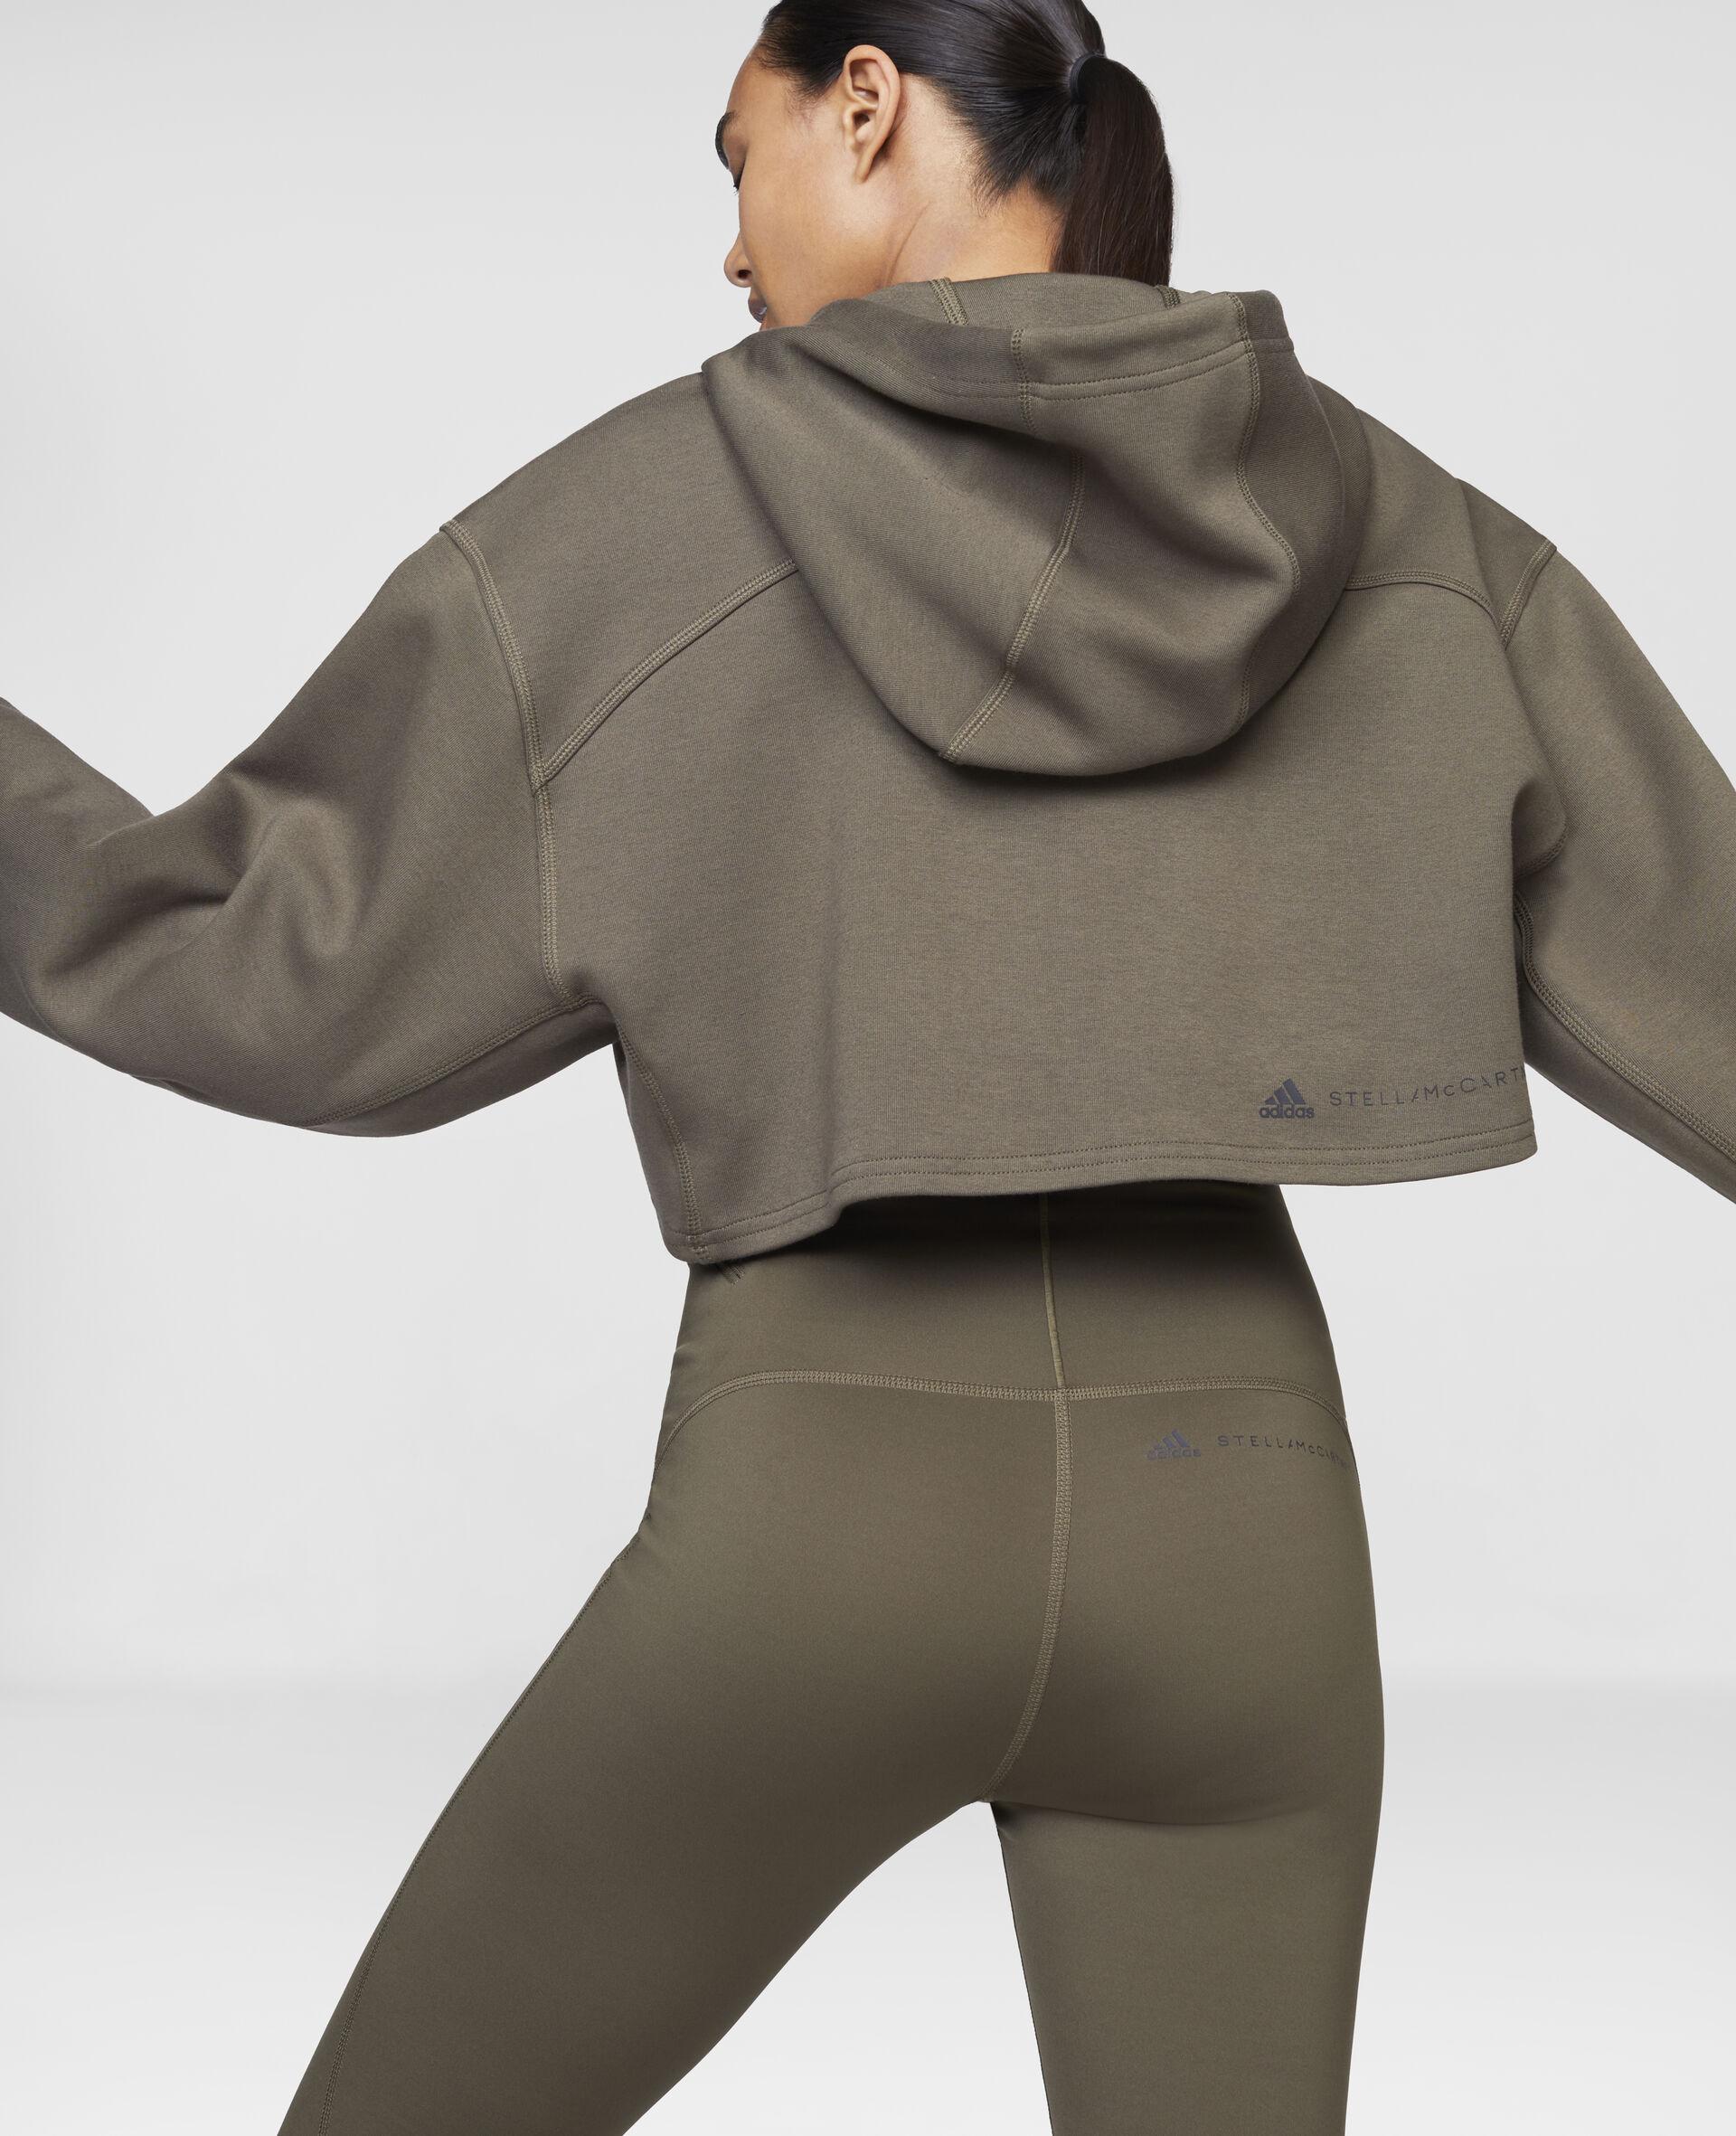 Dunkles Khaki Trainings-Strumpfhose-Brown-large image number 3